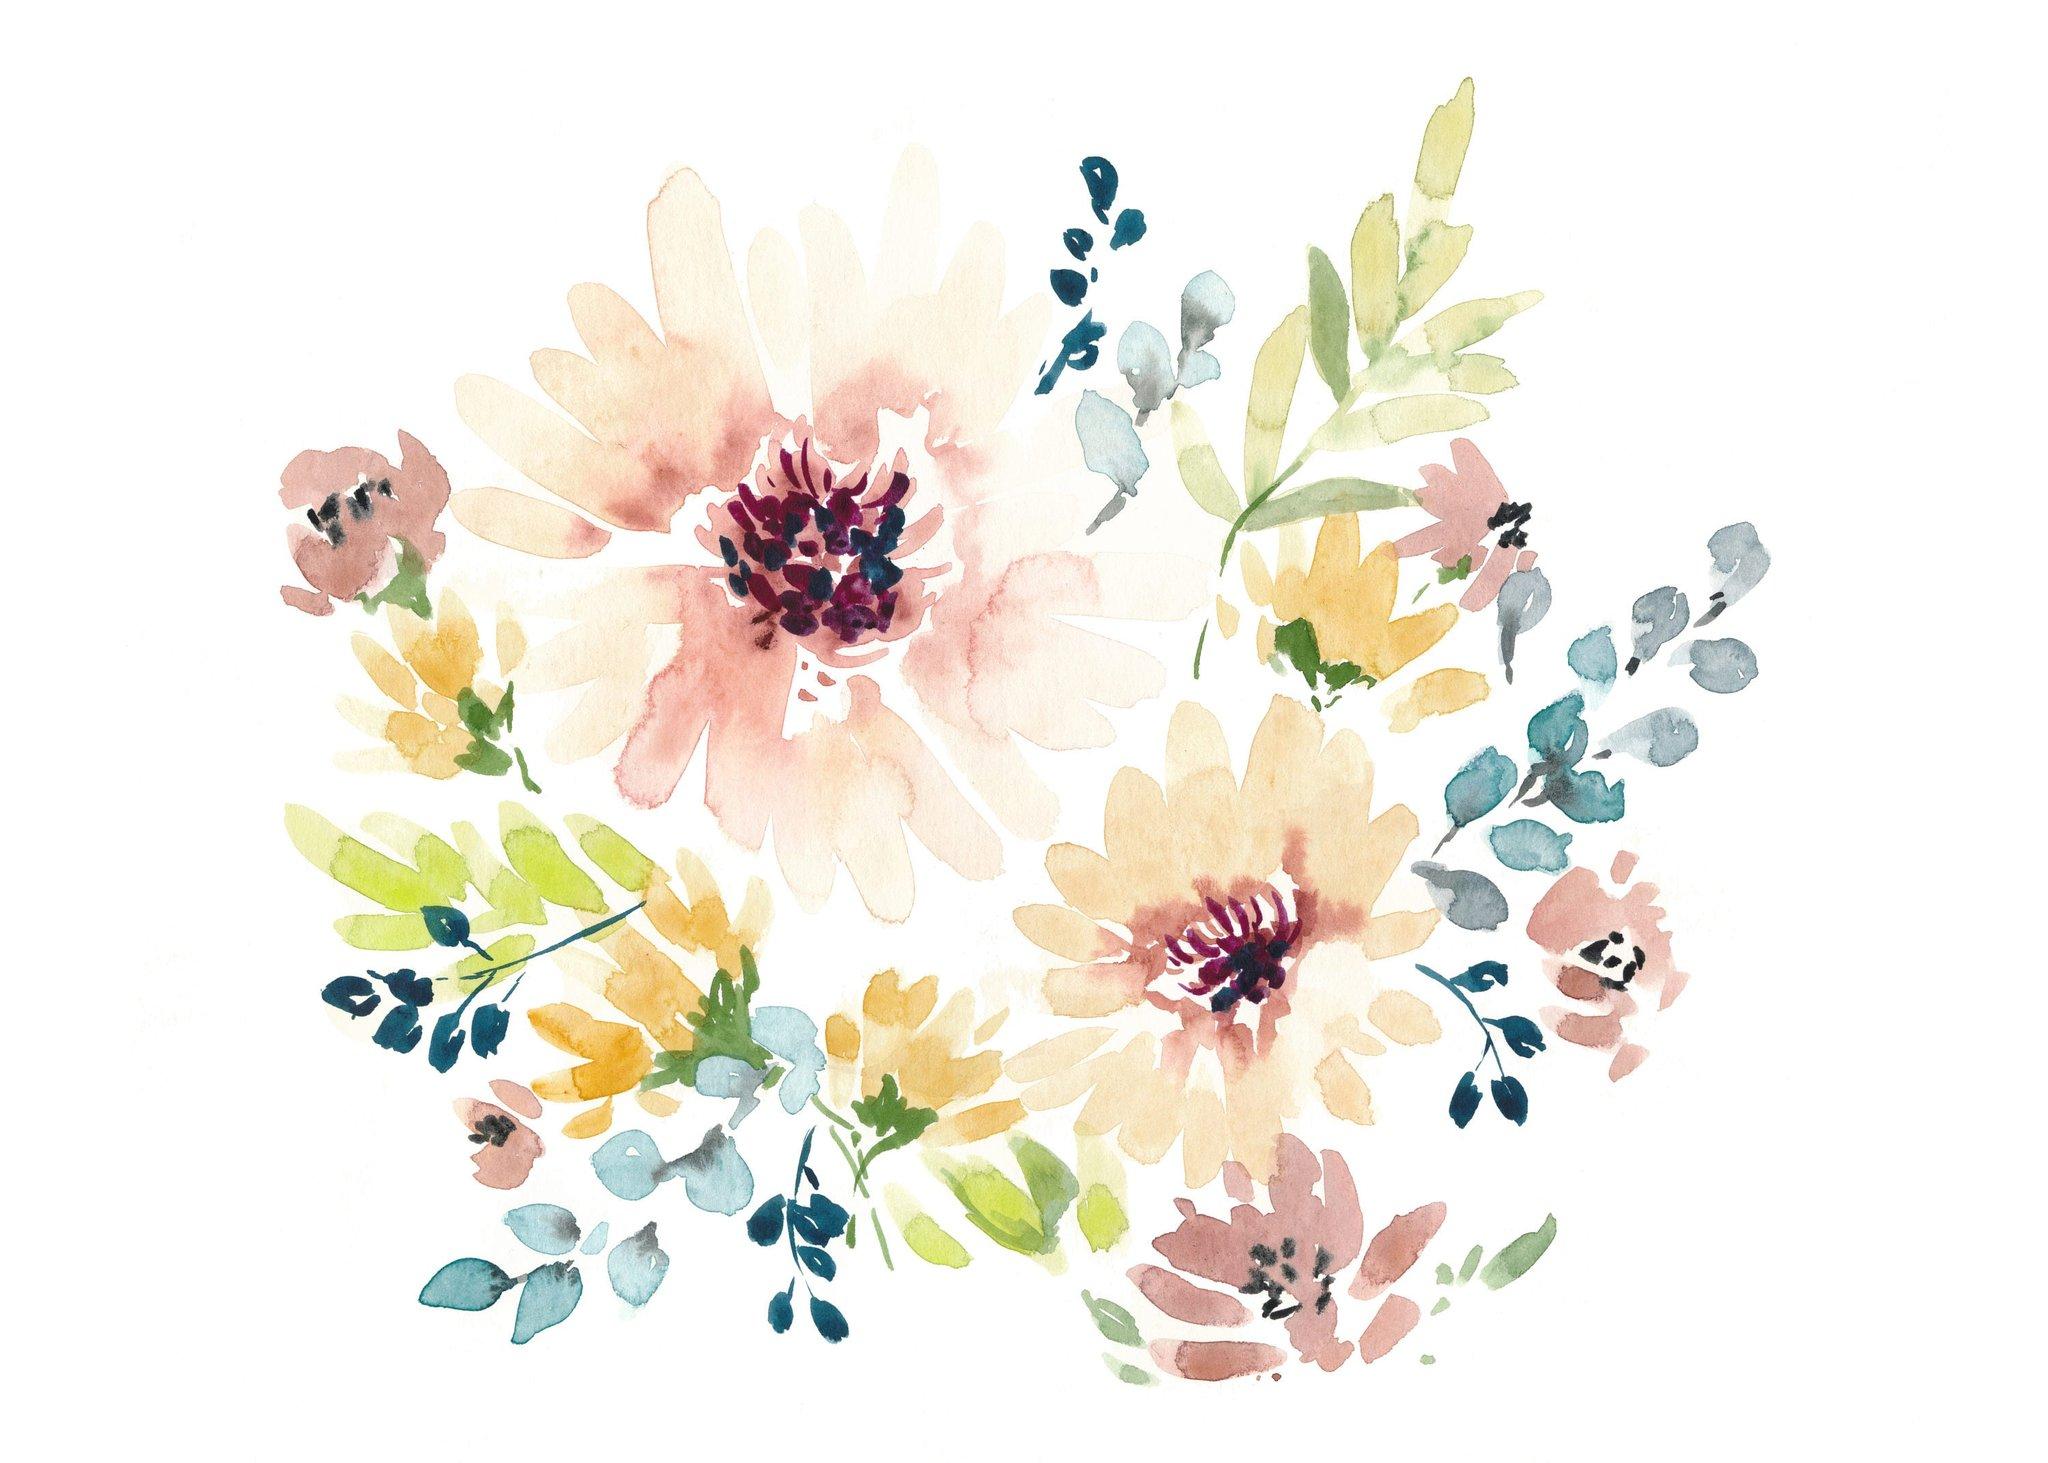 Постер цветы на белом фоне